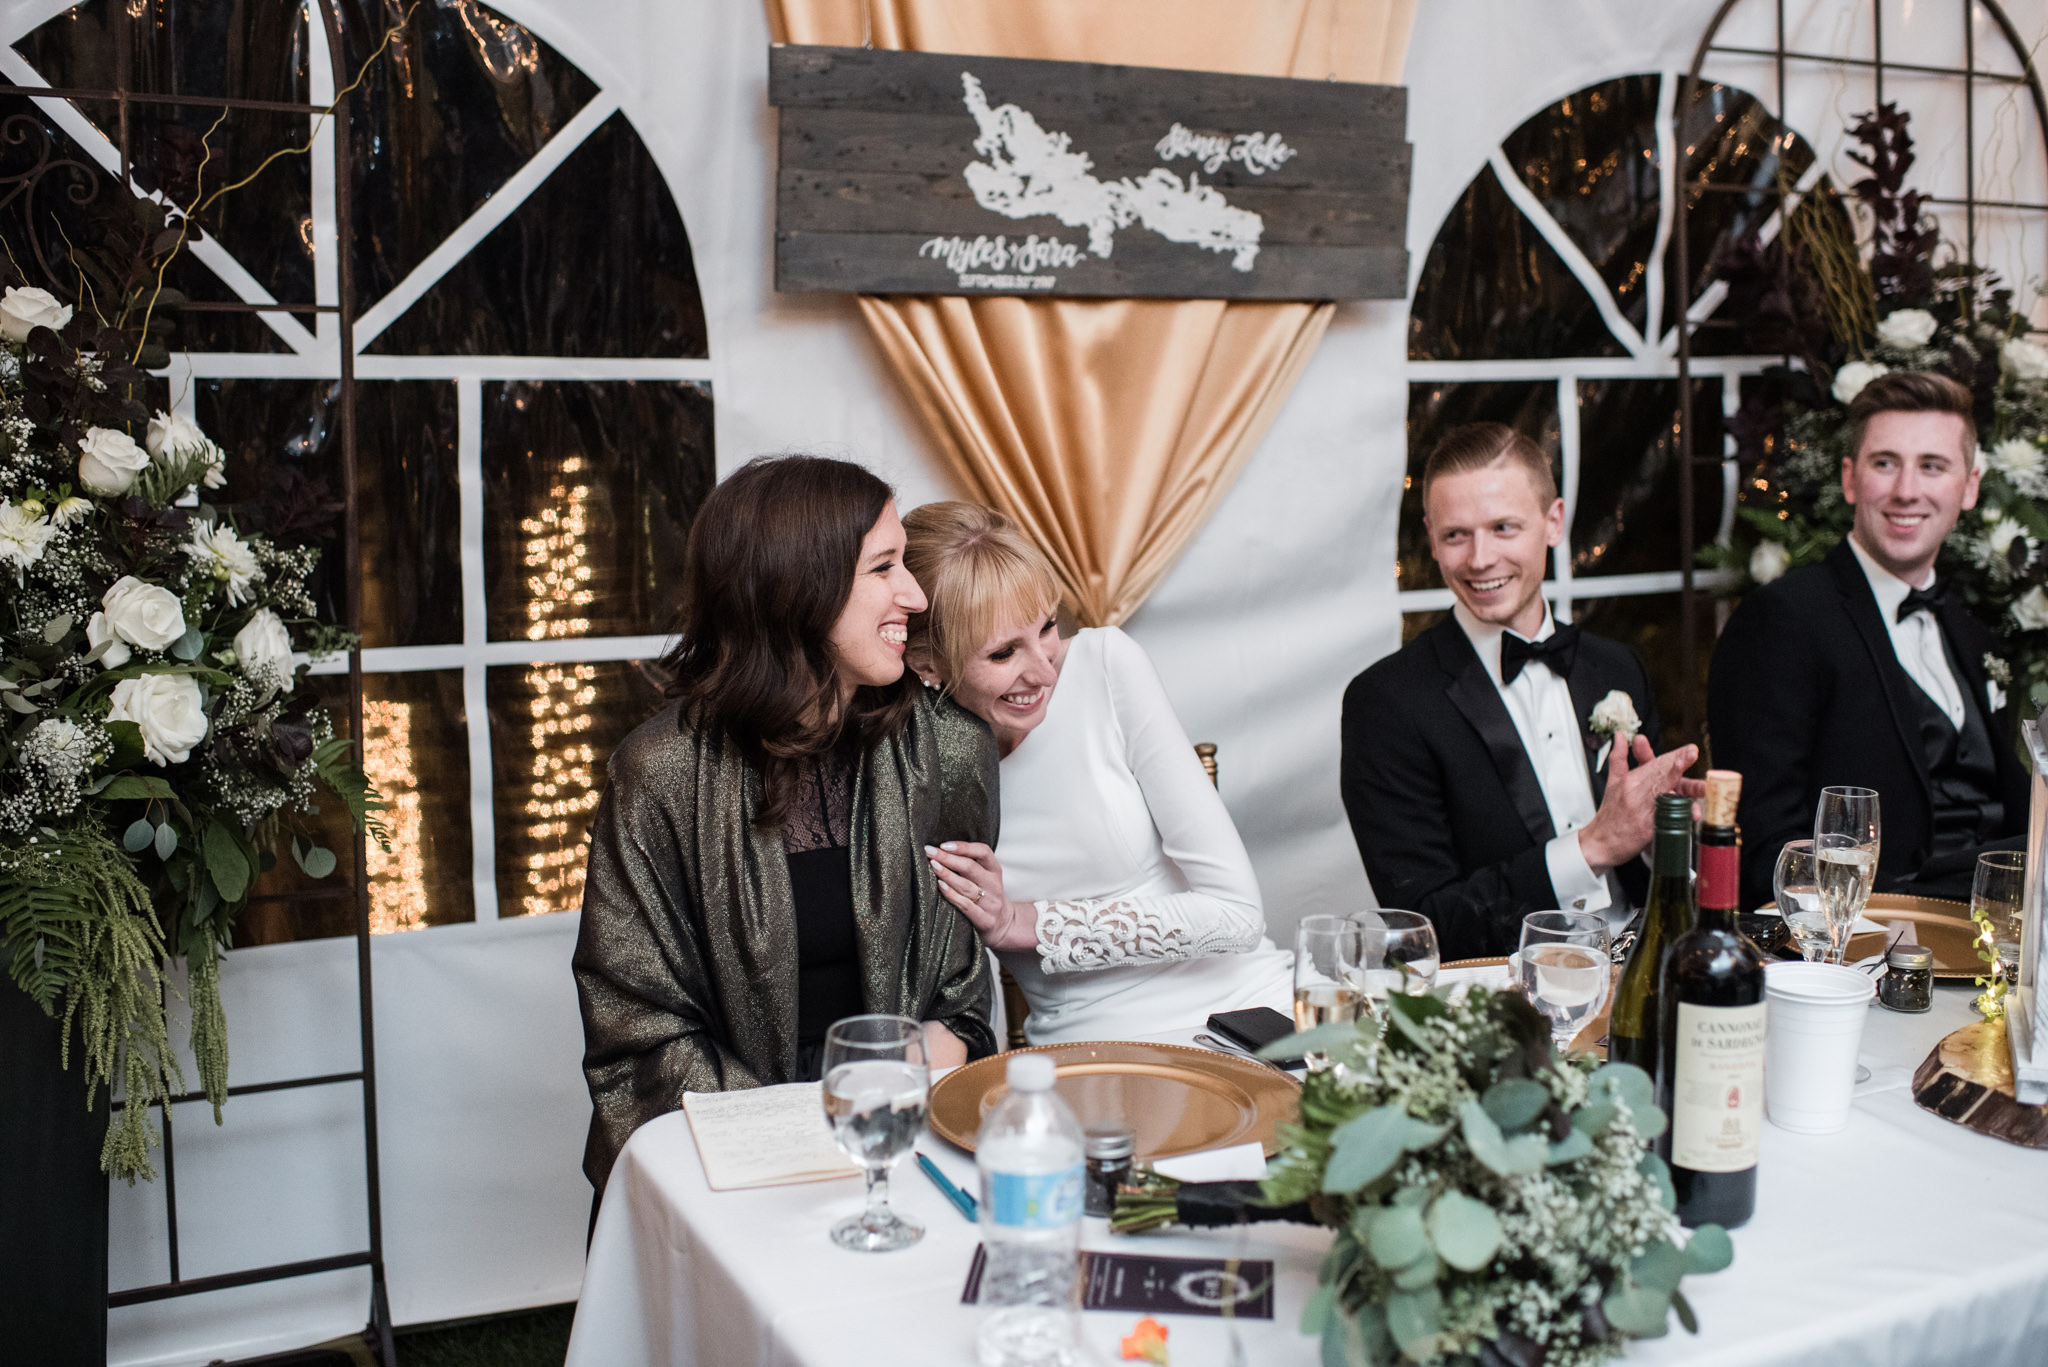 008-tent-wedding-reception-ontario-toronto-cottage.jpg